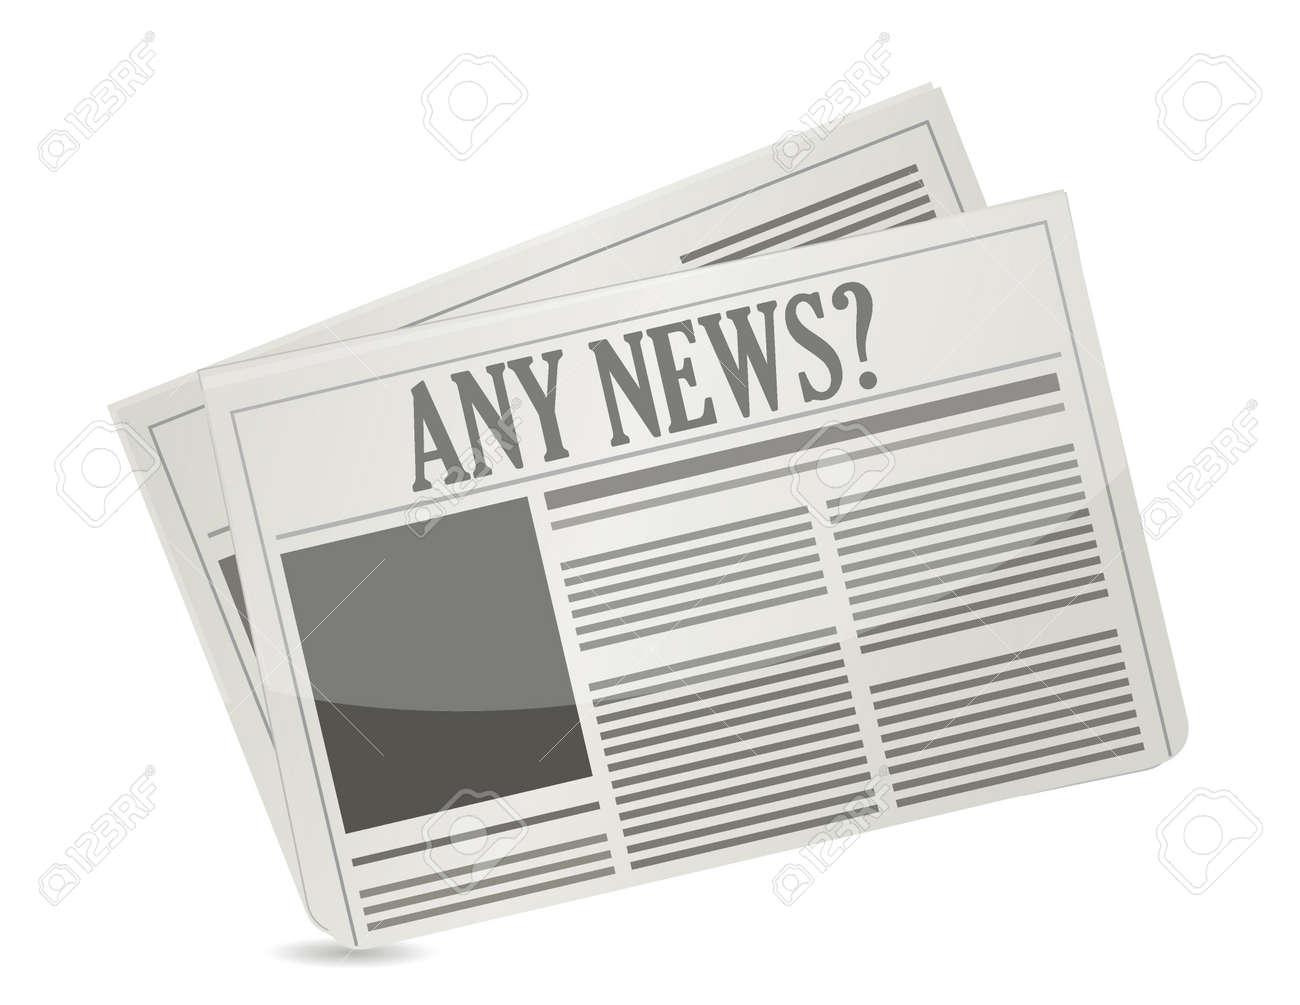 newspapers with headline